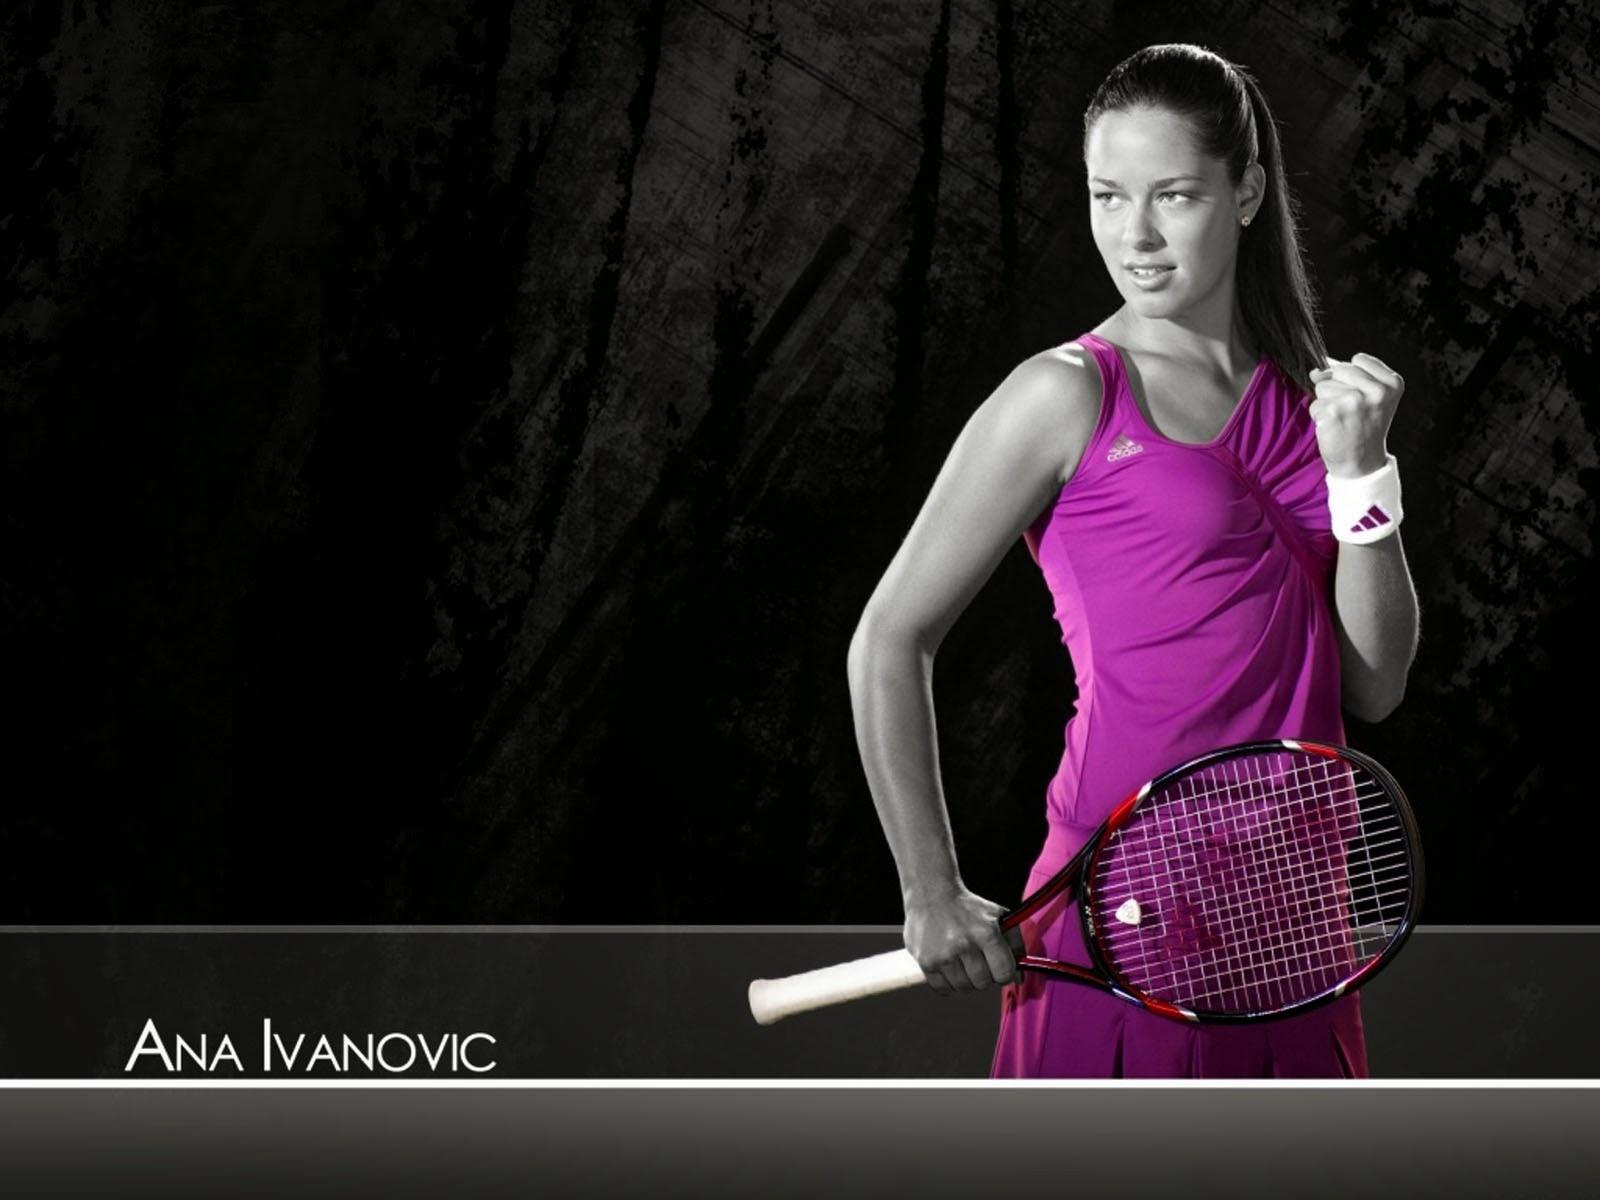 Wallpapers ana ivanovic wallpapers - Ana wallpaper ...